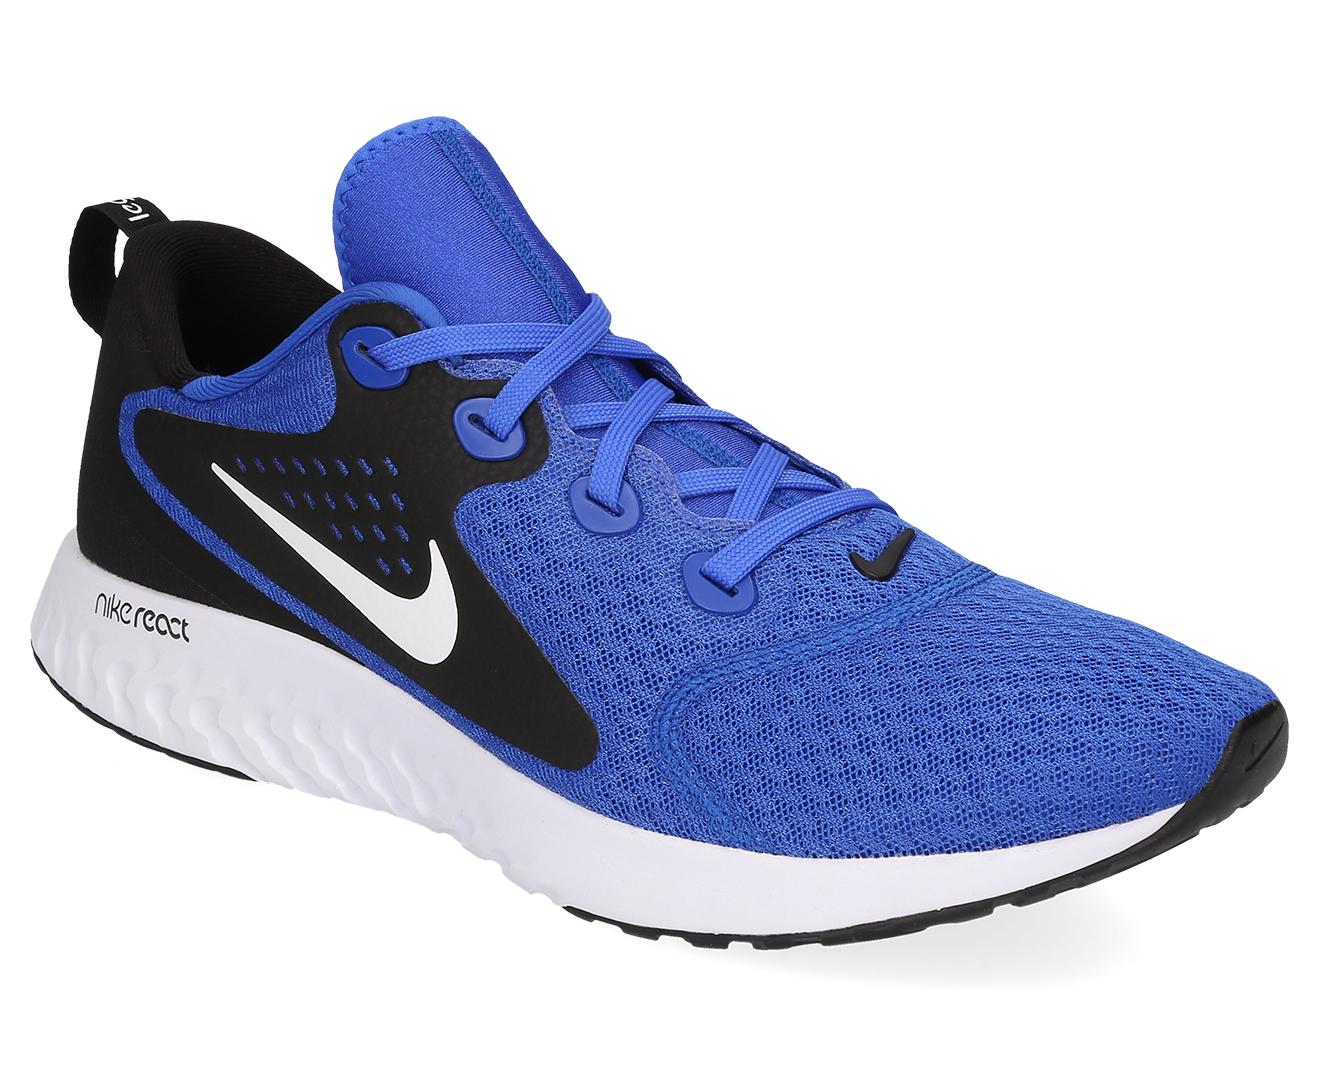 1bcf2d7e5270c Nike Men s Legend React Shoe - Hyper Royal White-Black